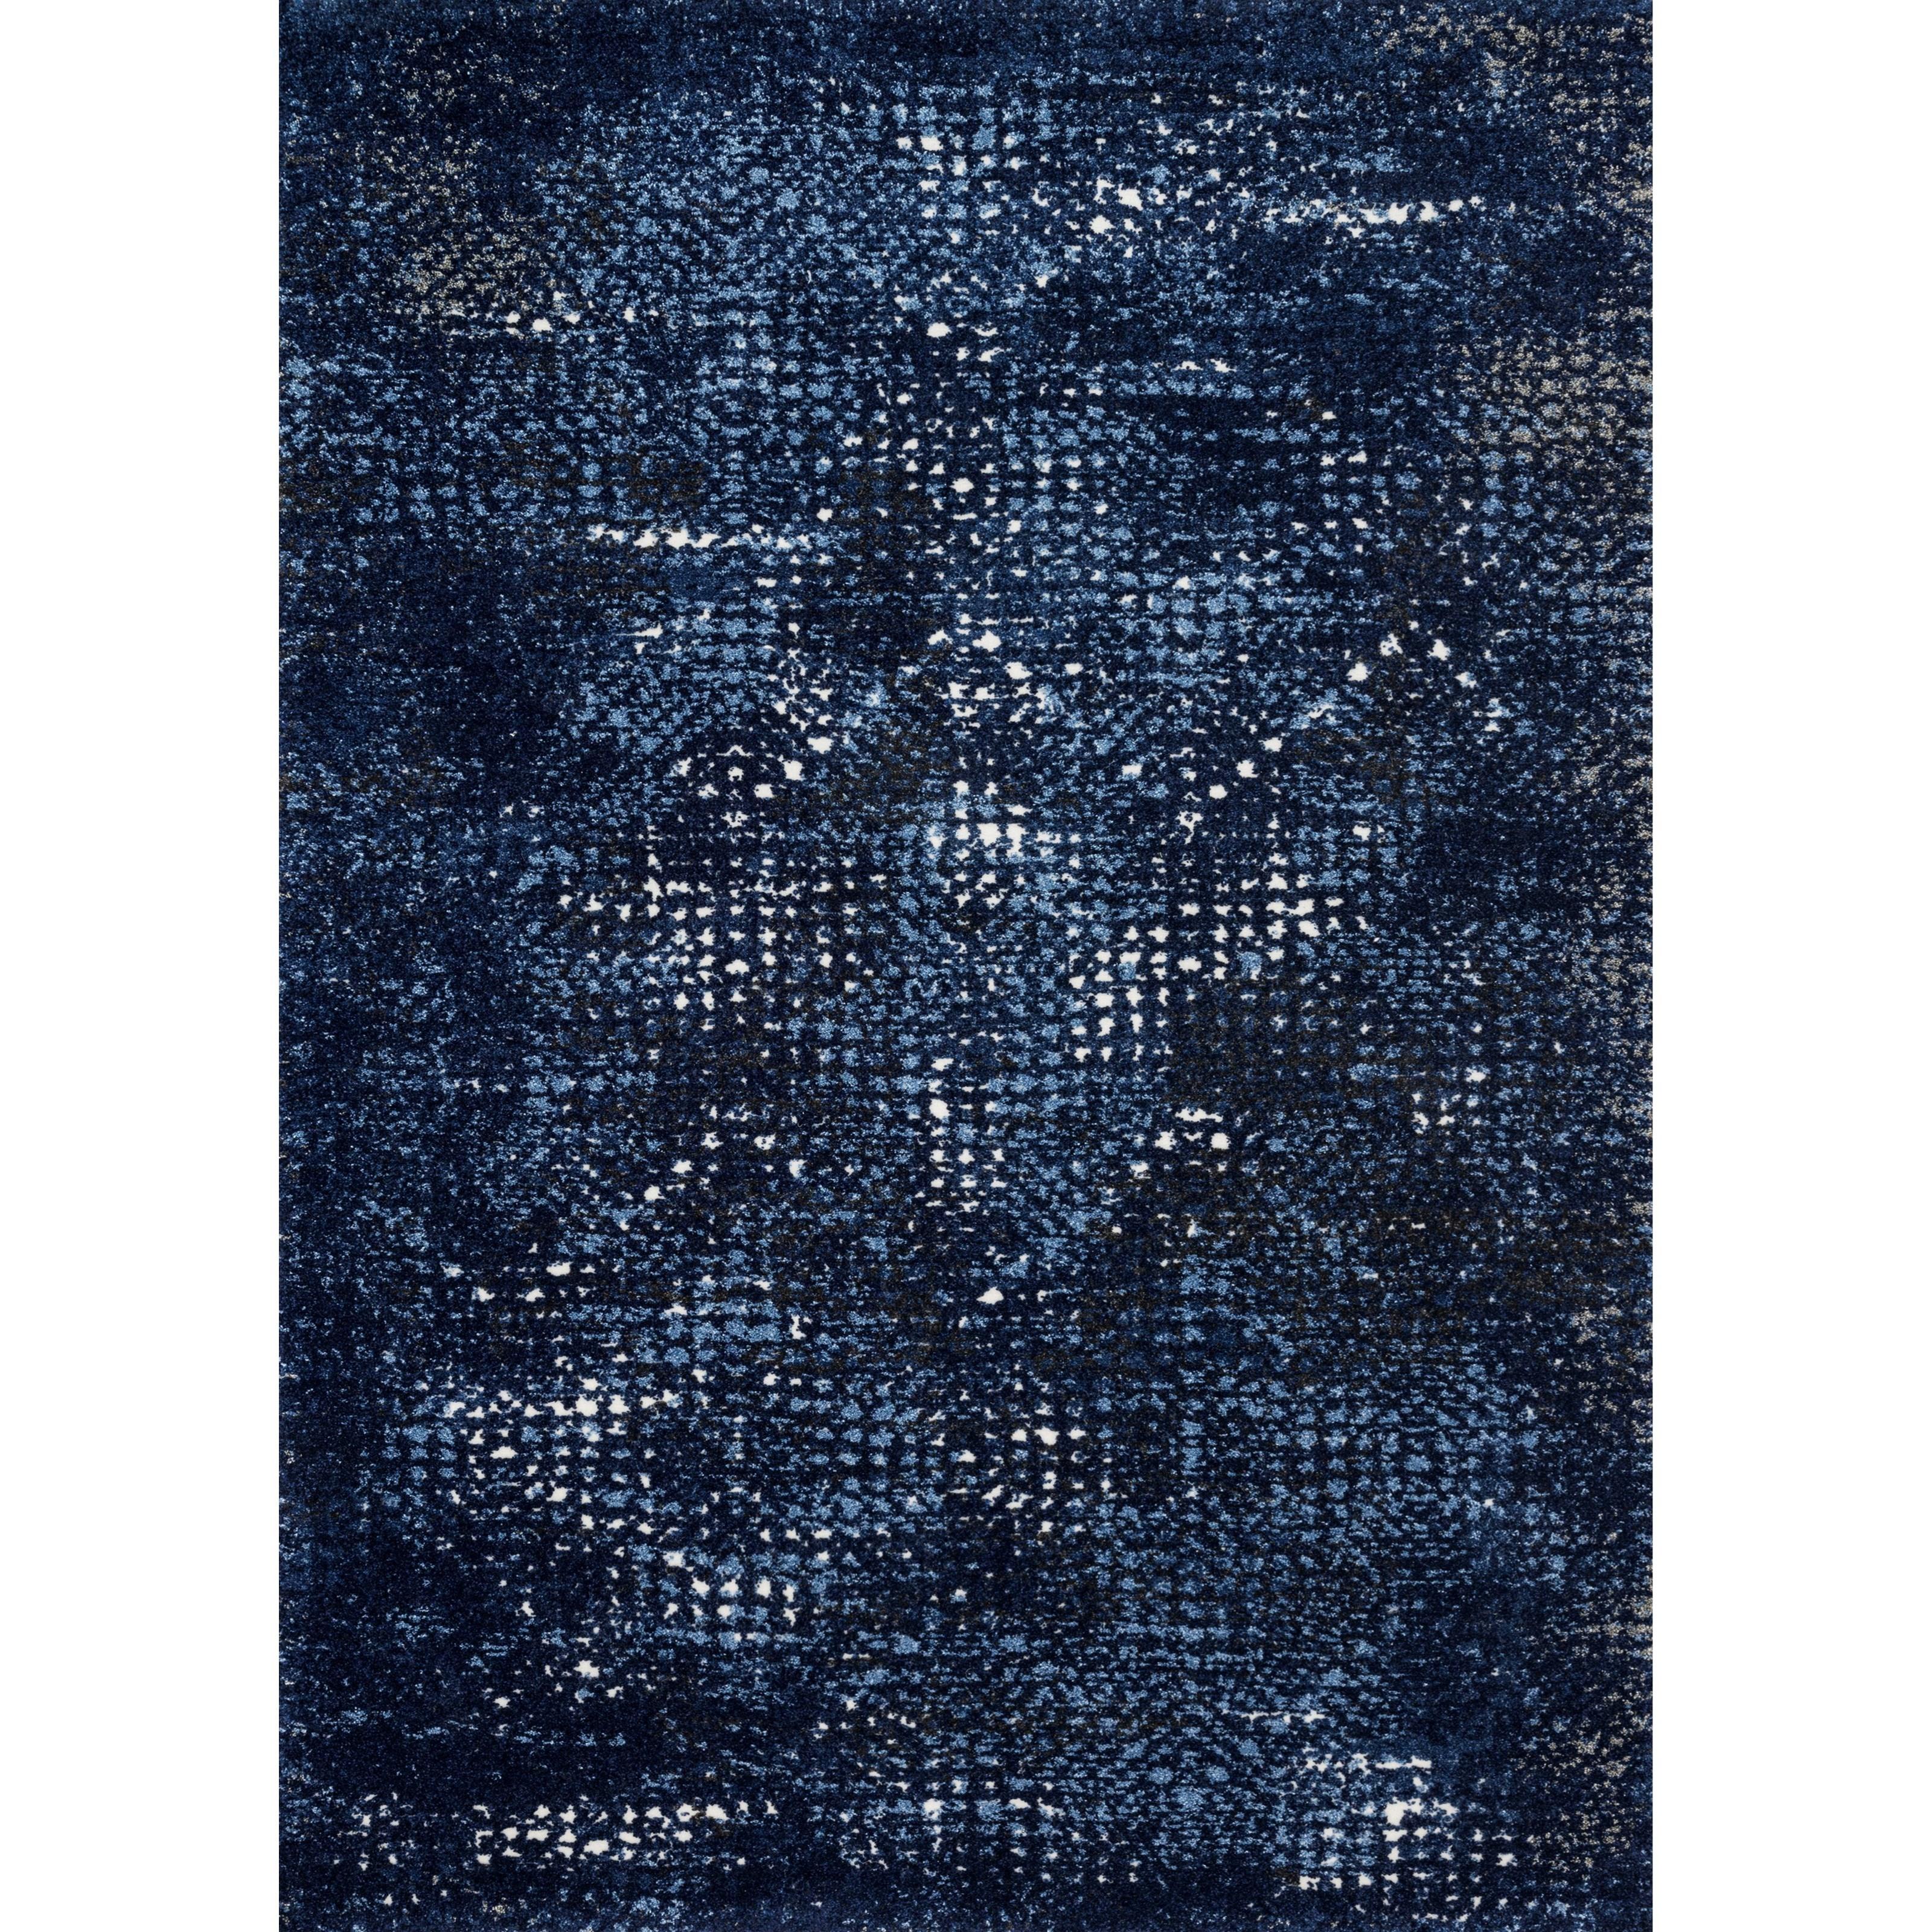 "Viera 1'6"" x 1'6""  Dark Blue / Light Blue Rug by Loloi Rugs at Pedigo Furniture"